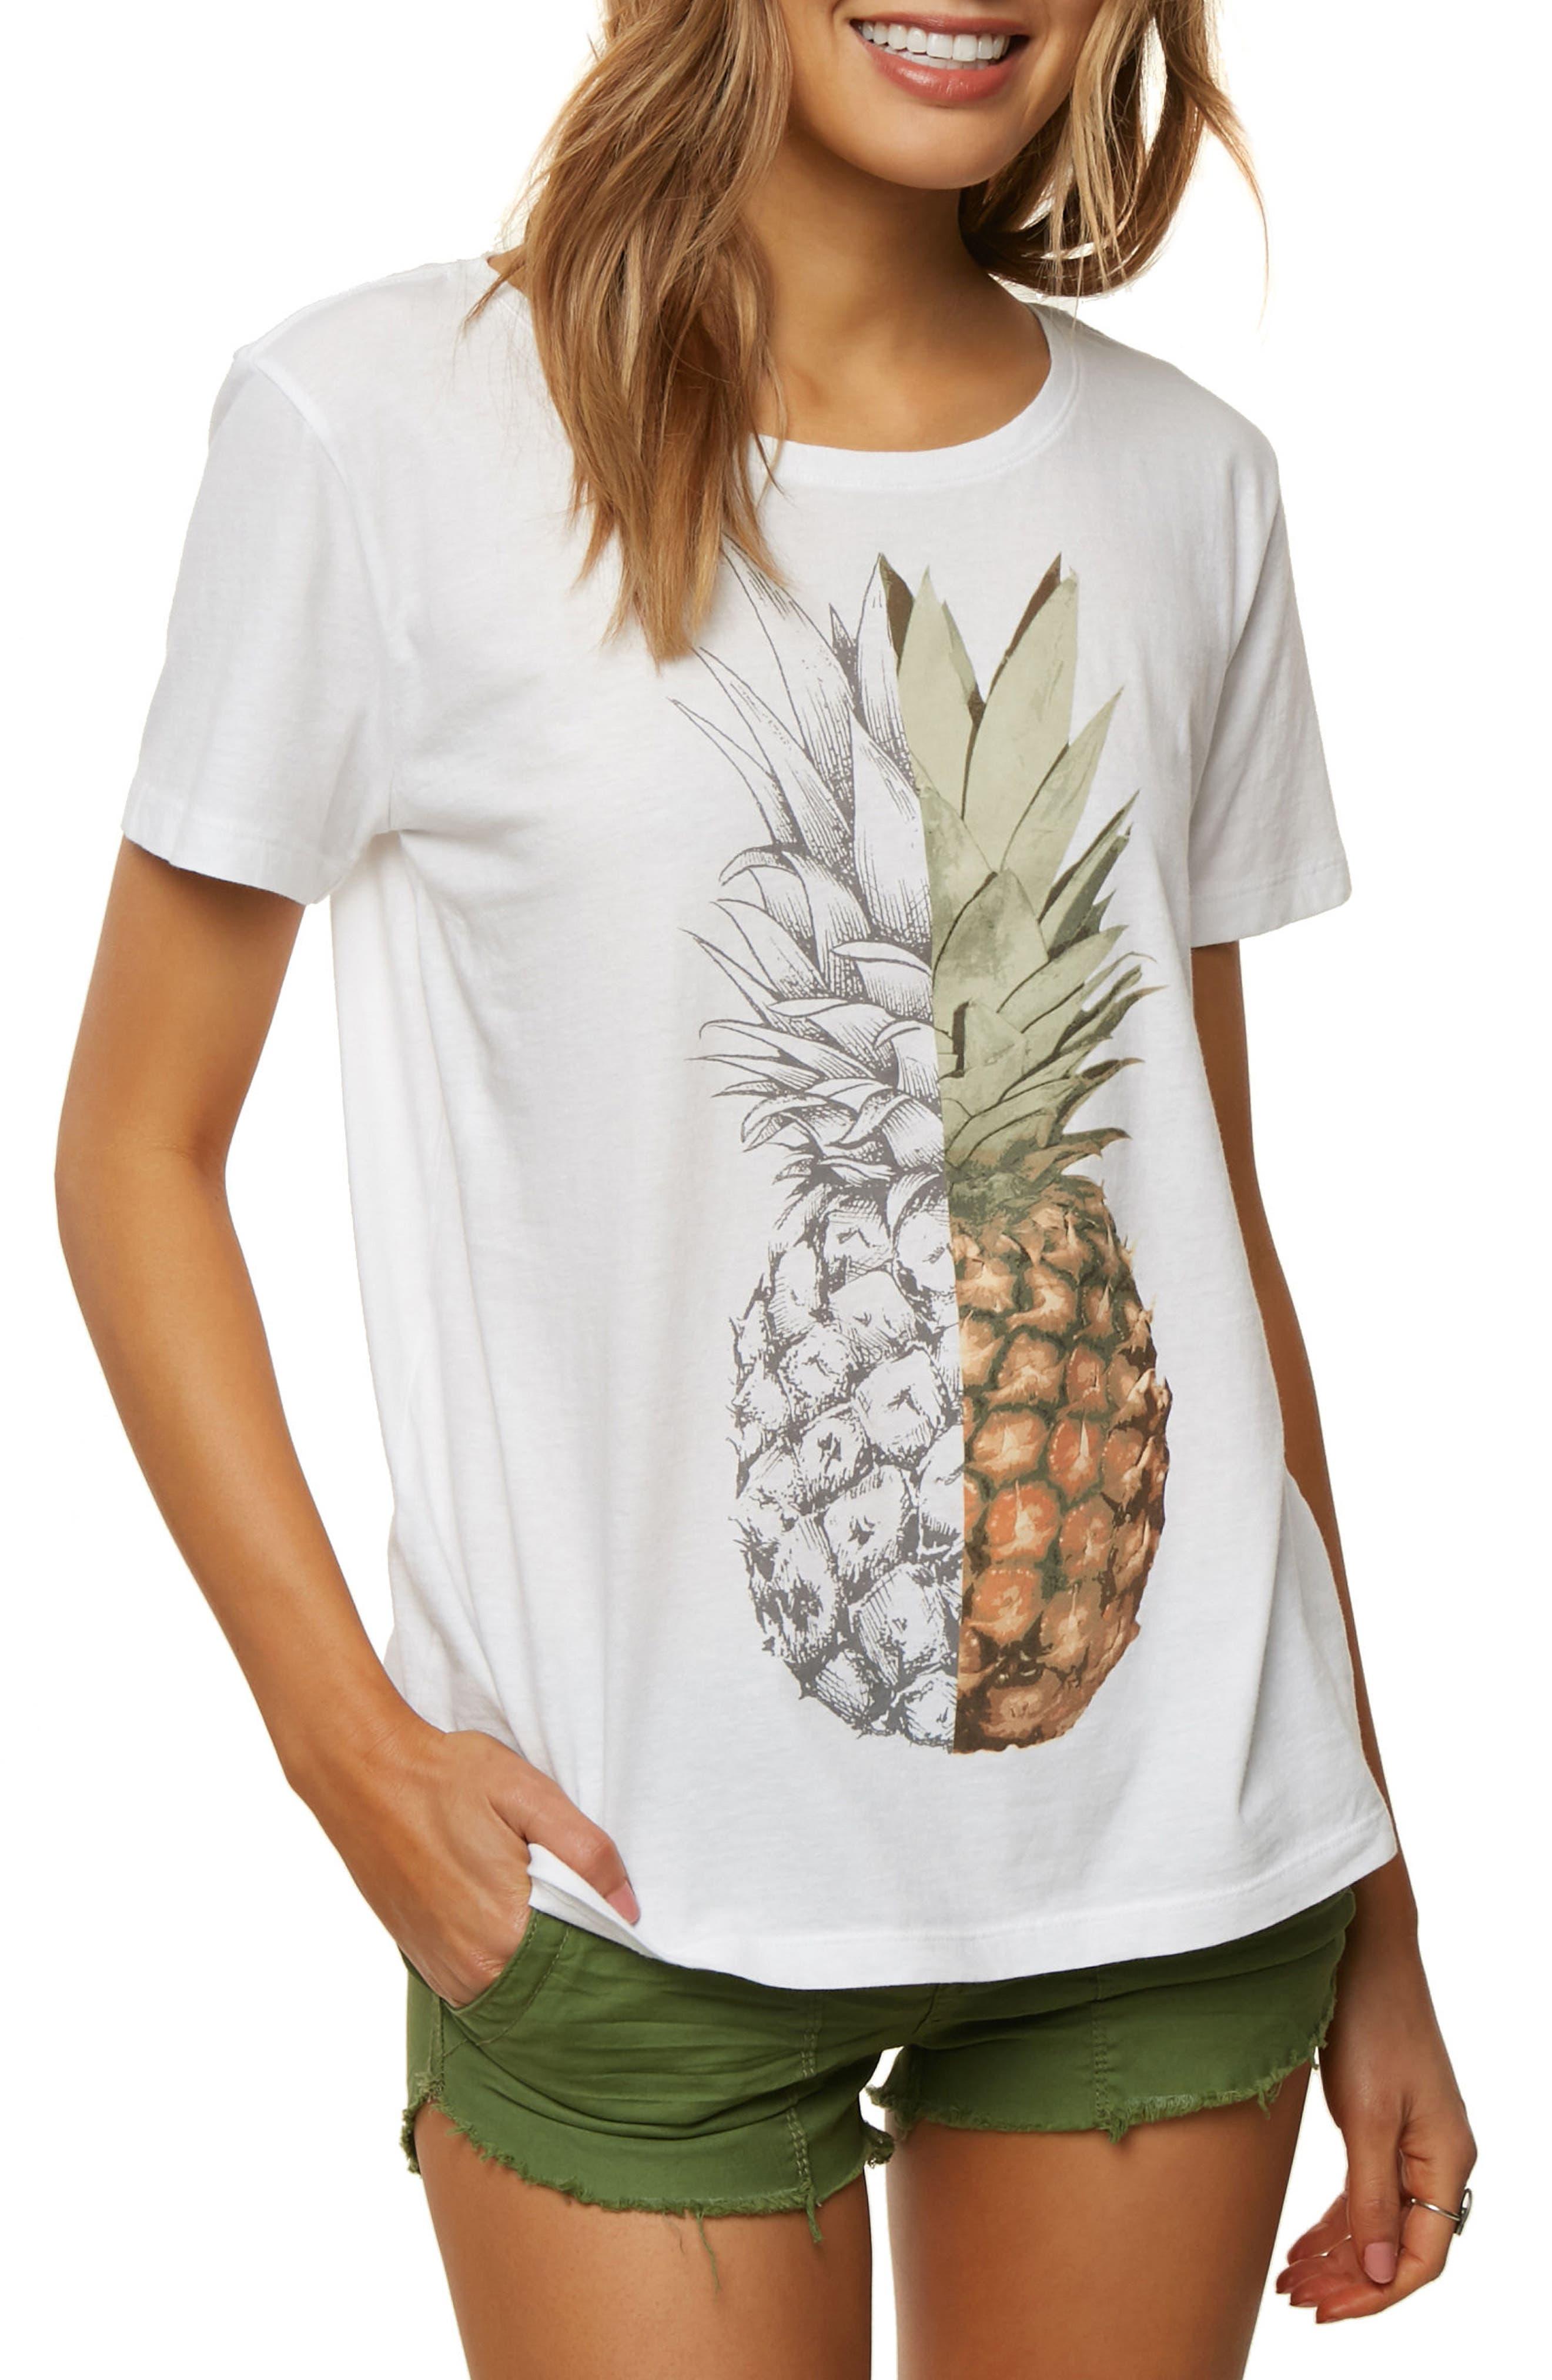 Main Image - O'Neill Half n Half Pineapple Graphic Tee